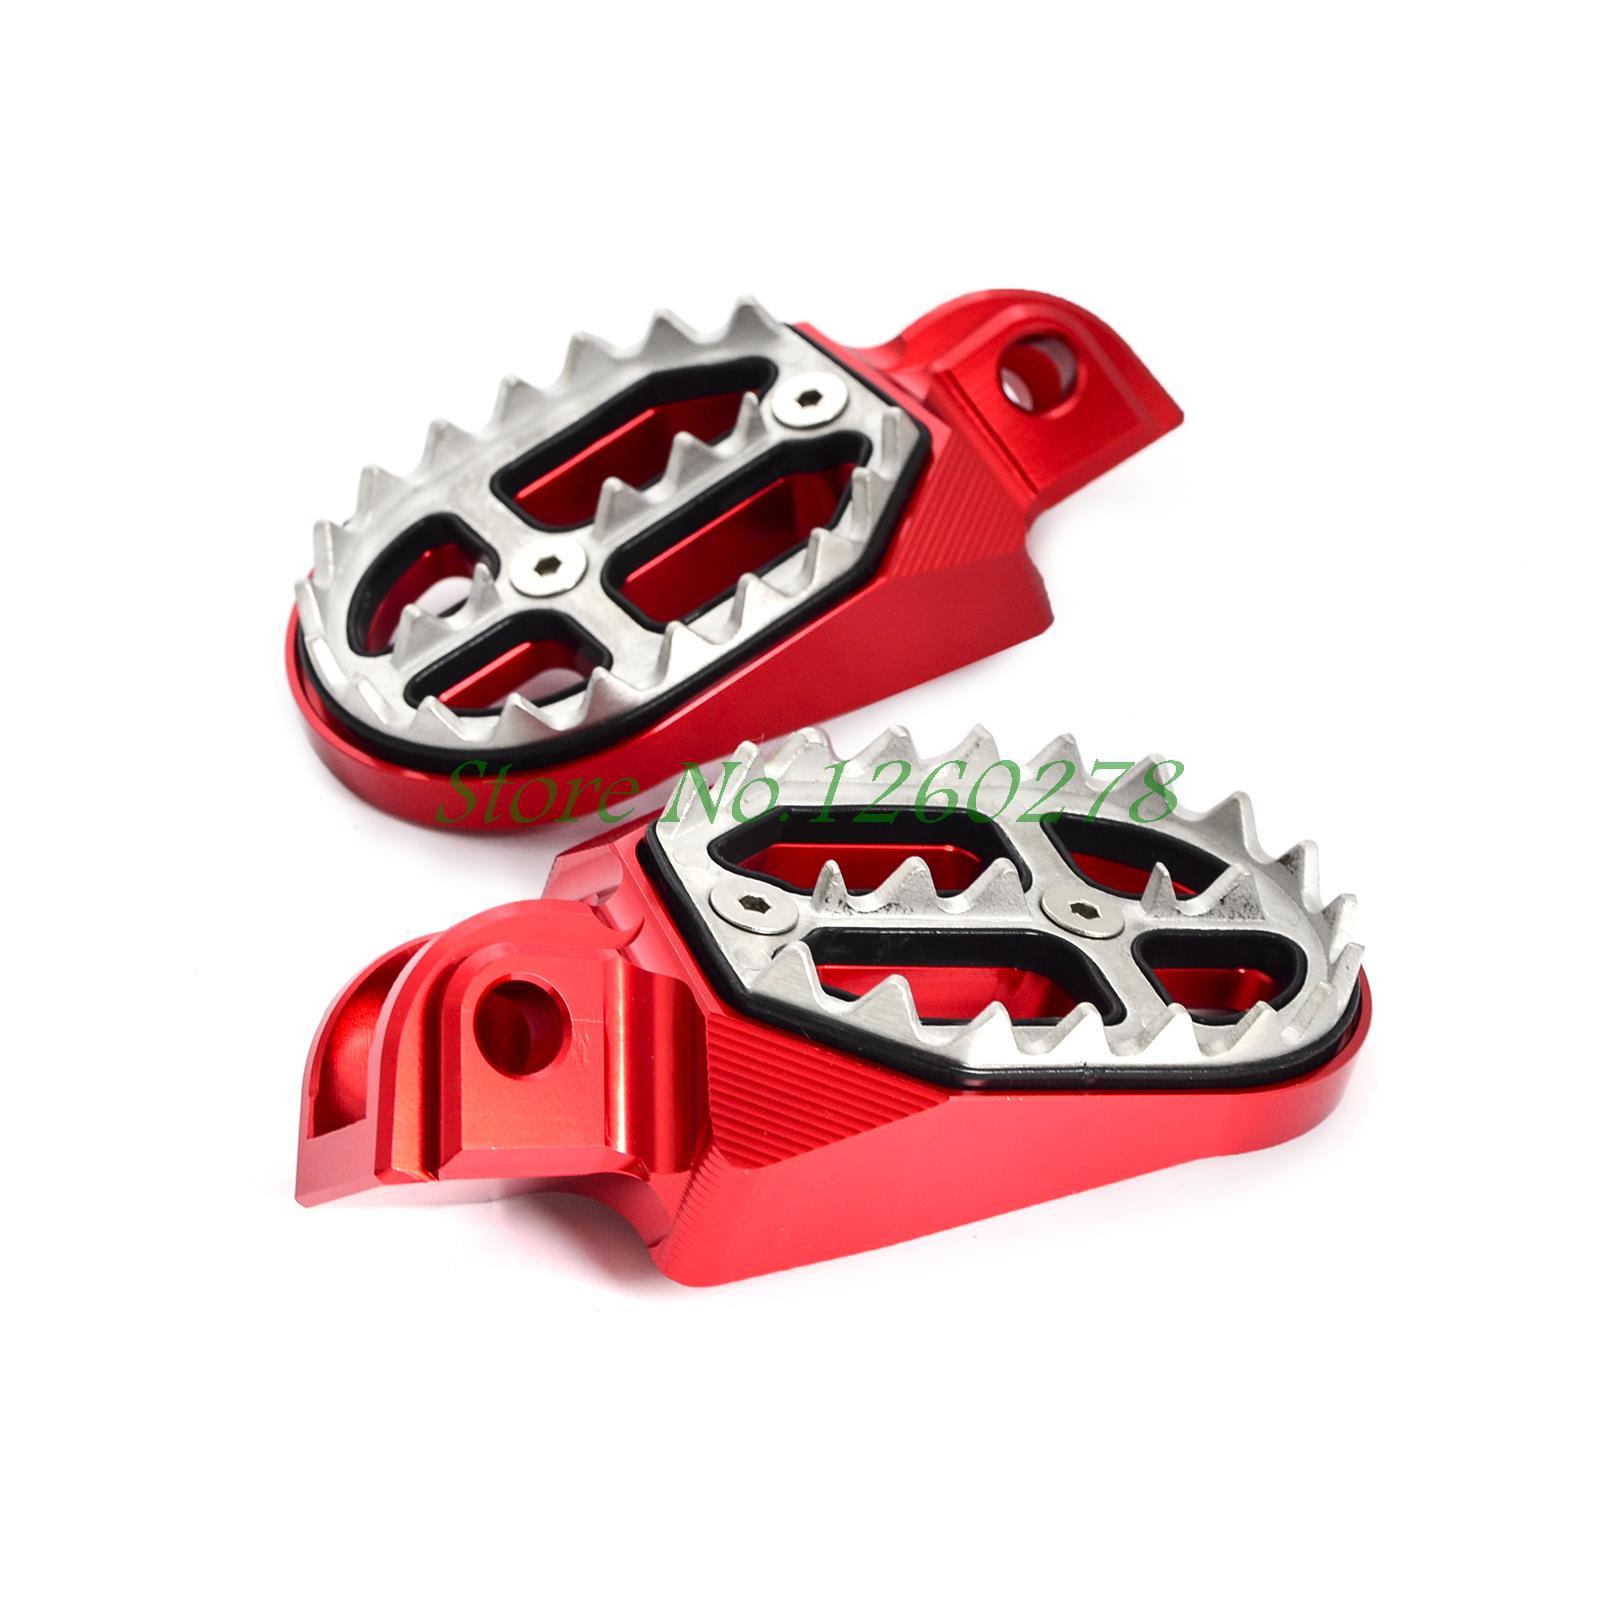 Billet MX Foot Pegs FootRest Pedals For Beta RR 4T 350 390 400 430 450 480 498 520 525 2T 125 200 300 X Trainer 250 300 Motard цена